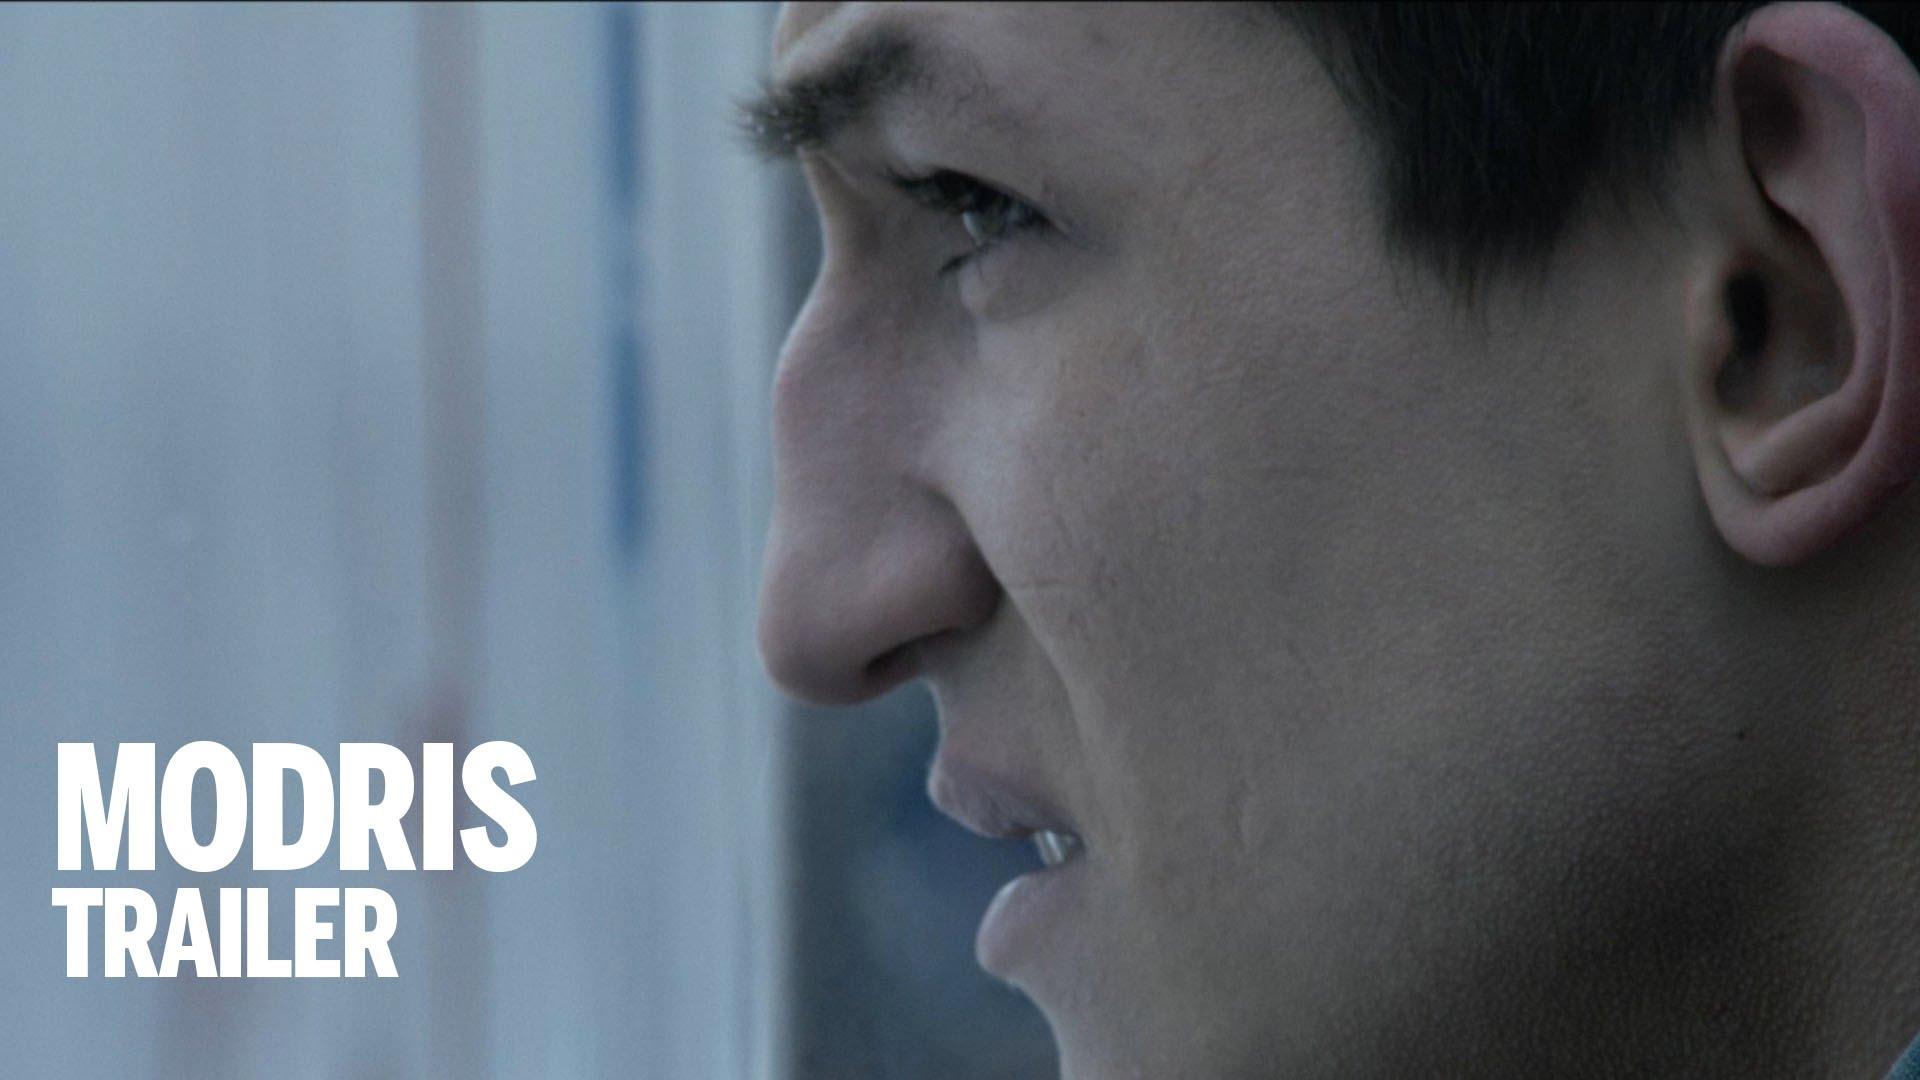 Modris Trailer